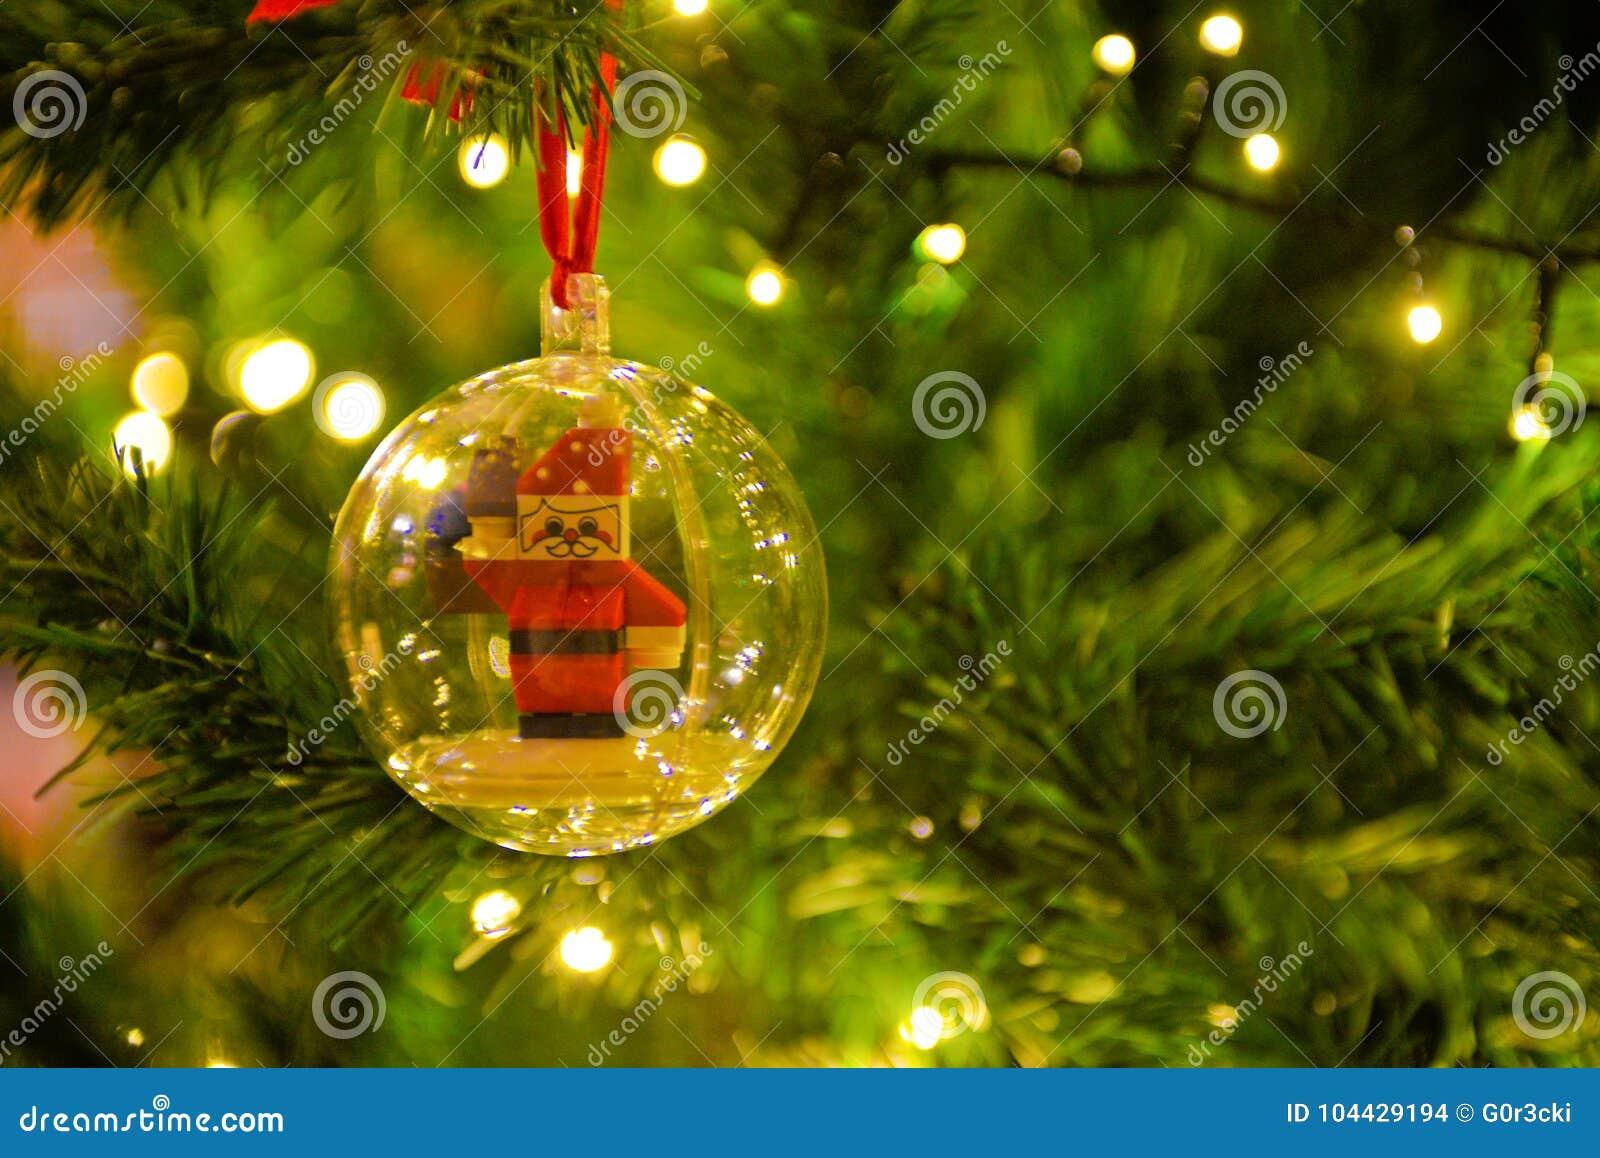 Christmas Decorations Santa Claus Inside Transparent Ball Xmas Tree Lights